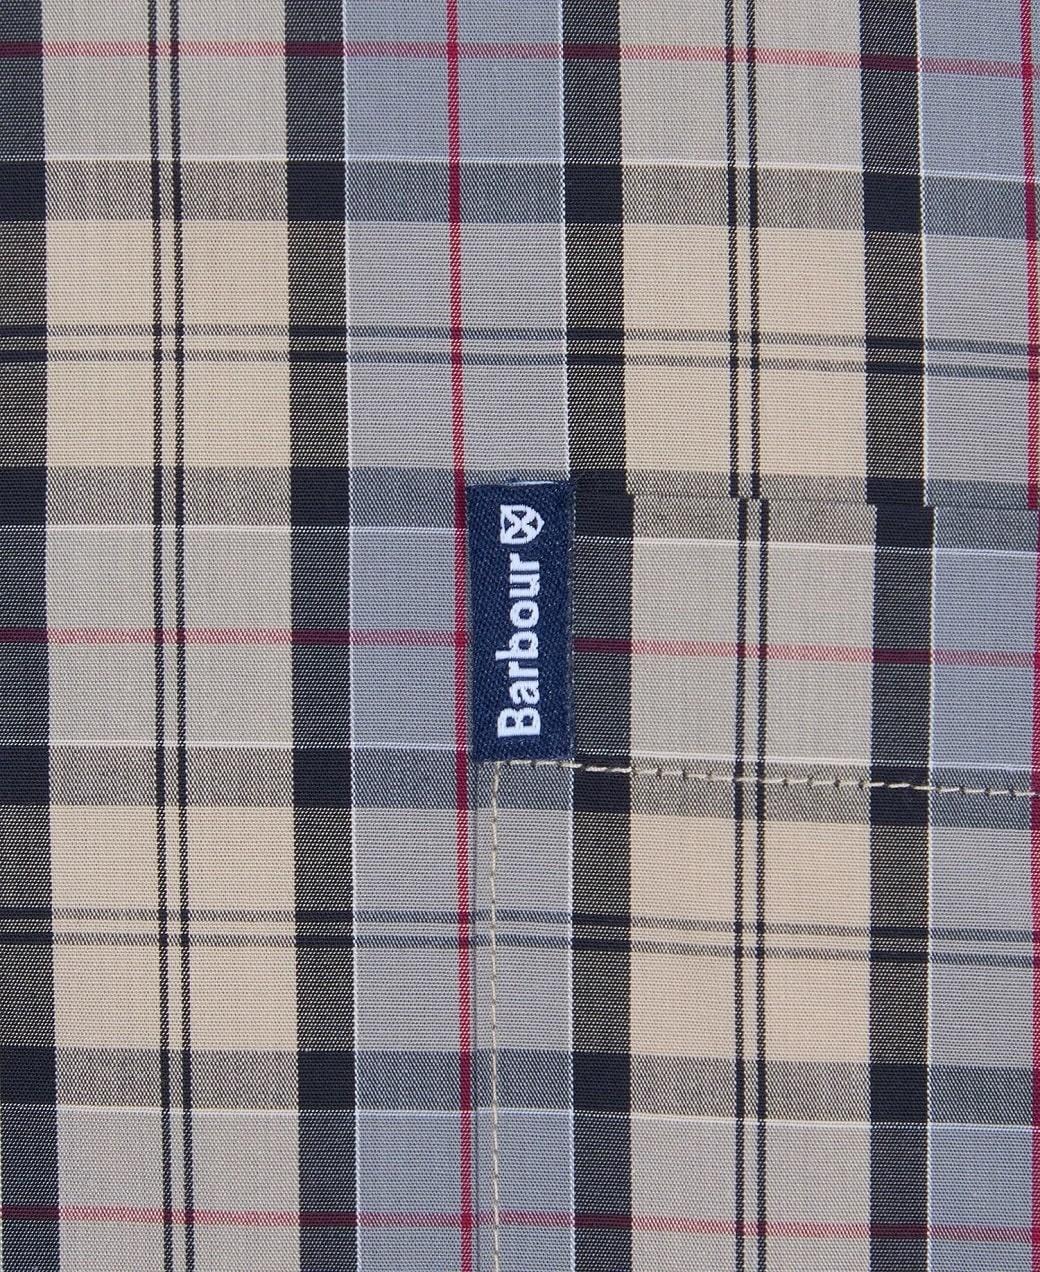 Barbour Tartan 17 Tailored  Shirt Dress Tartan-6